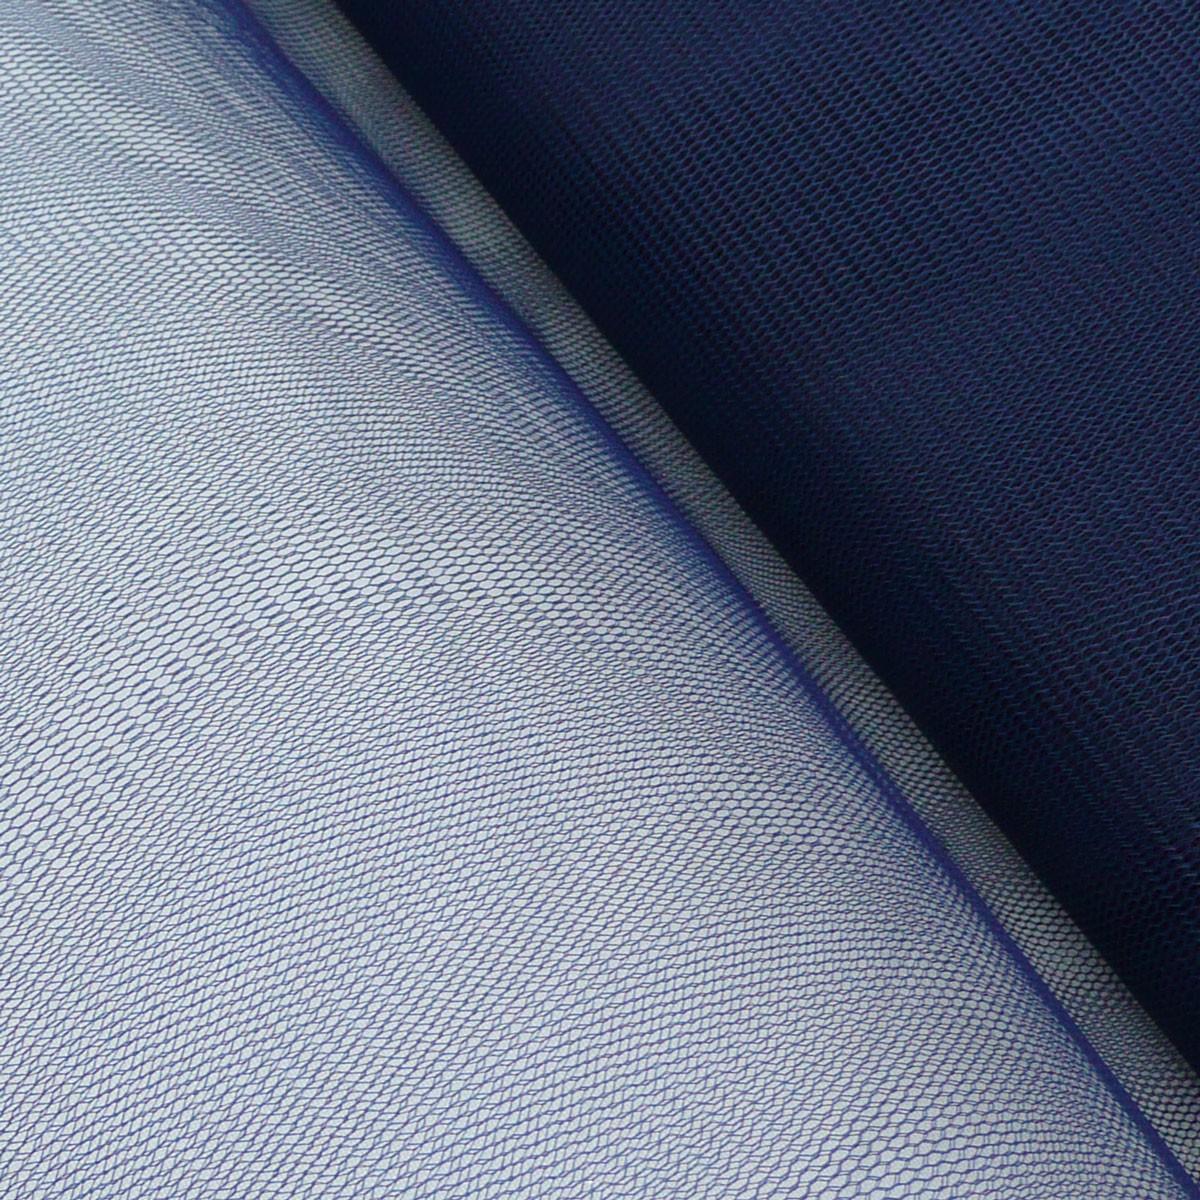 Kreativstoff Tüll Polyester dunkelblau 1,4m Breite